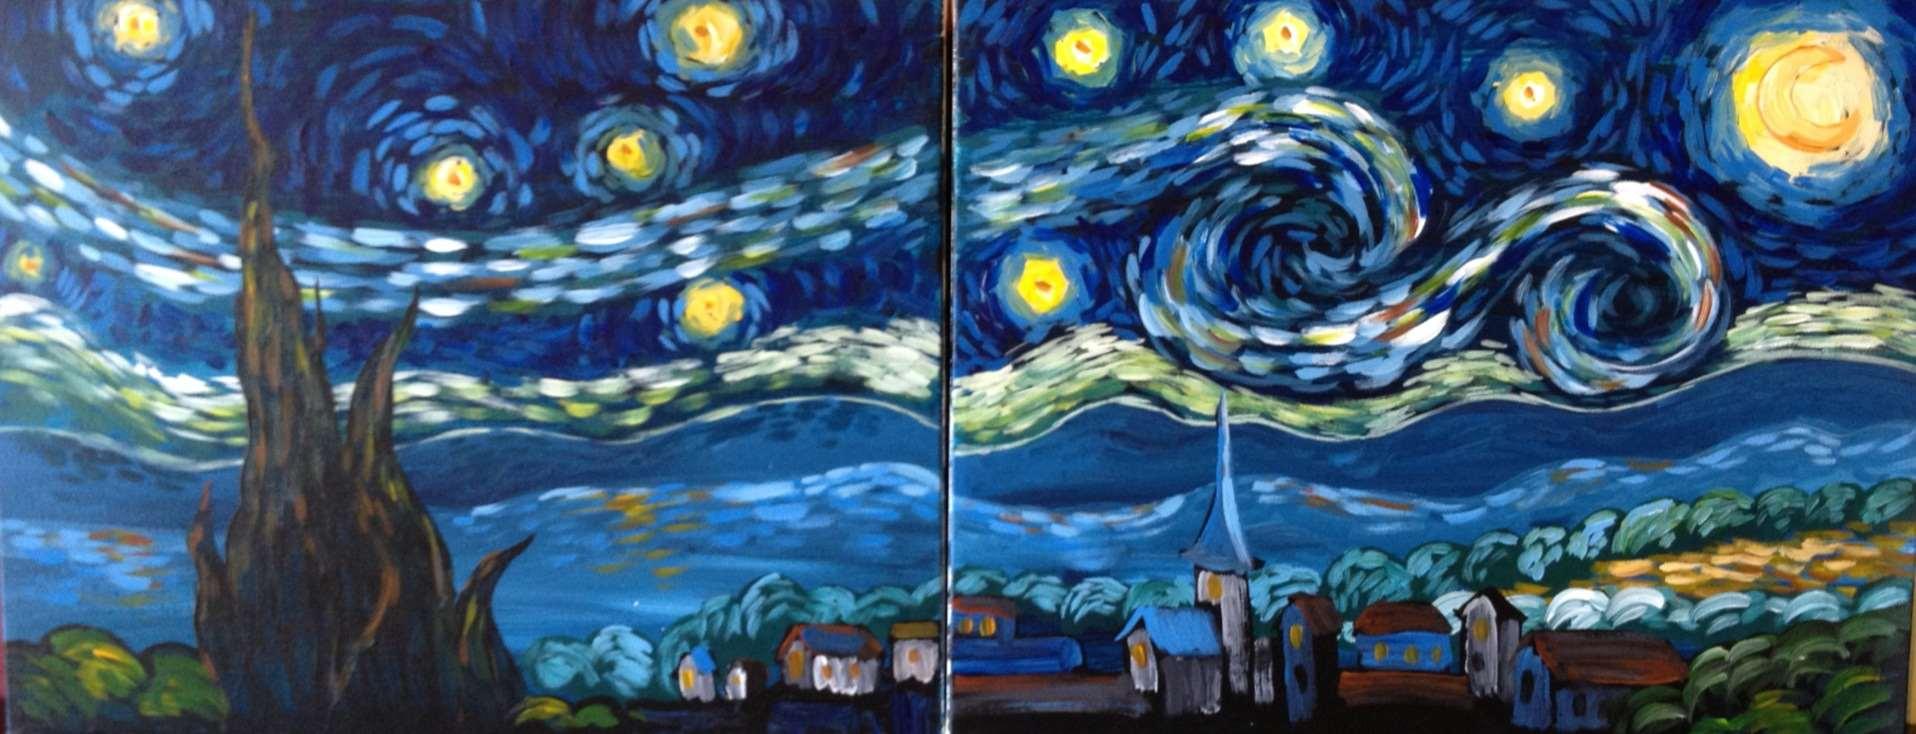 Date Night Starry Night - September 21